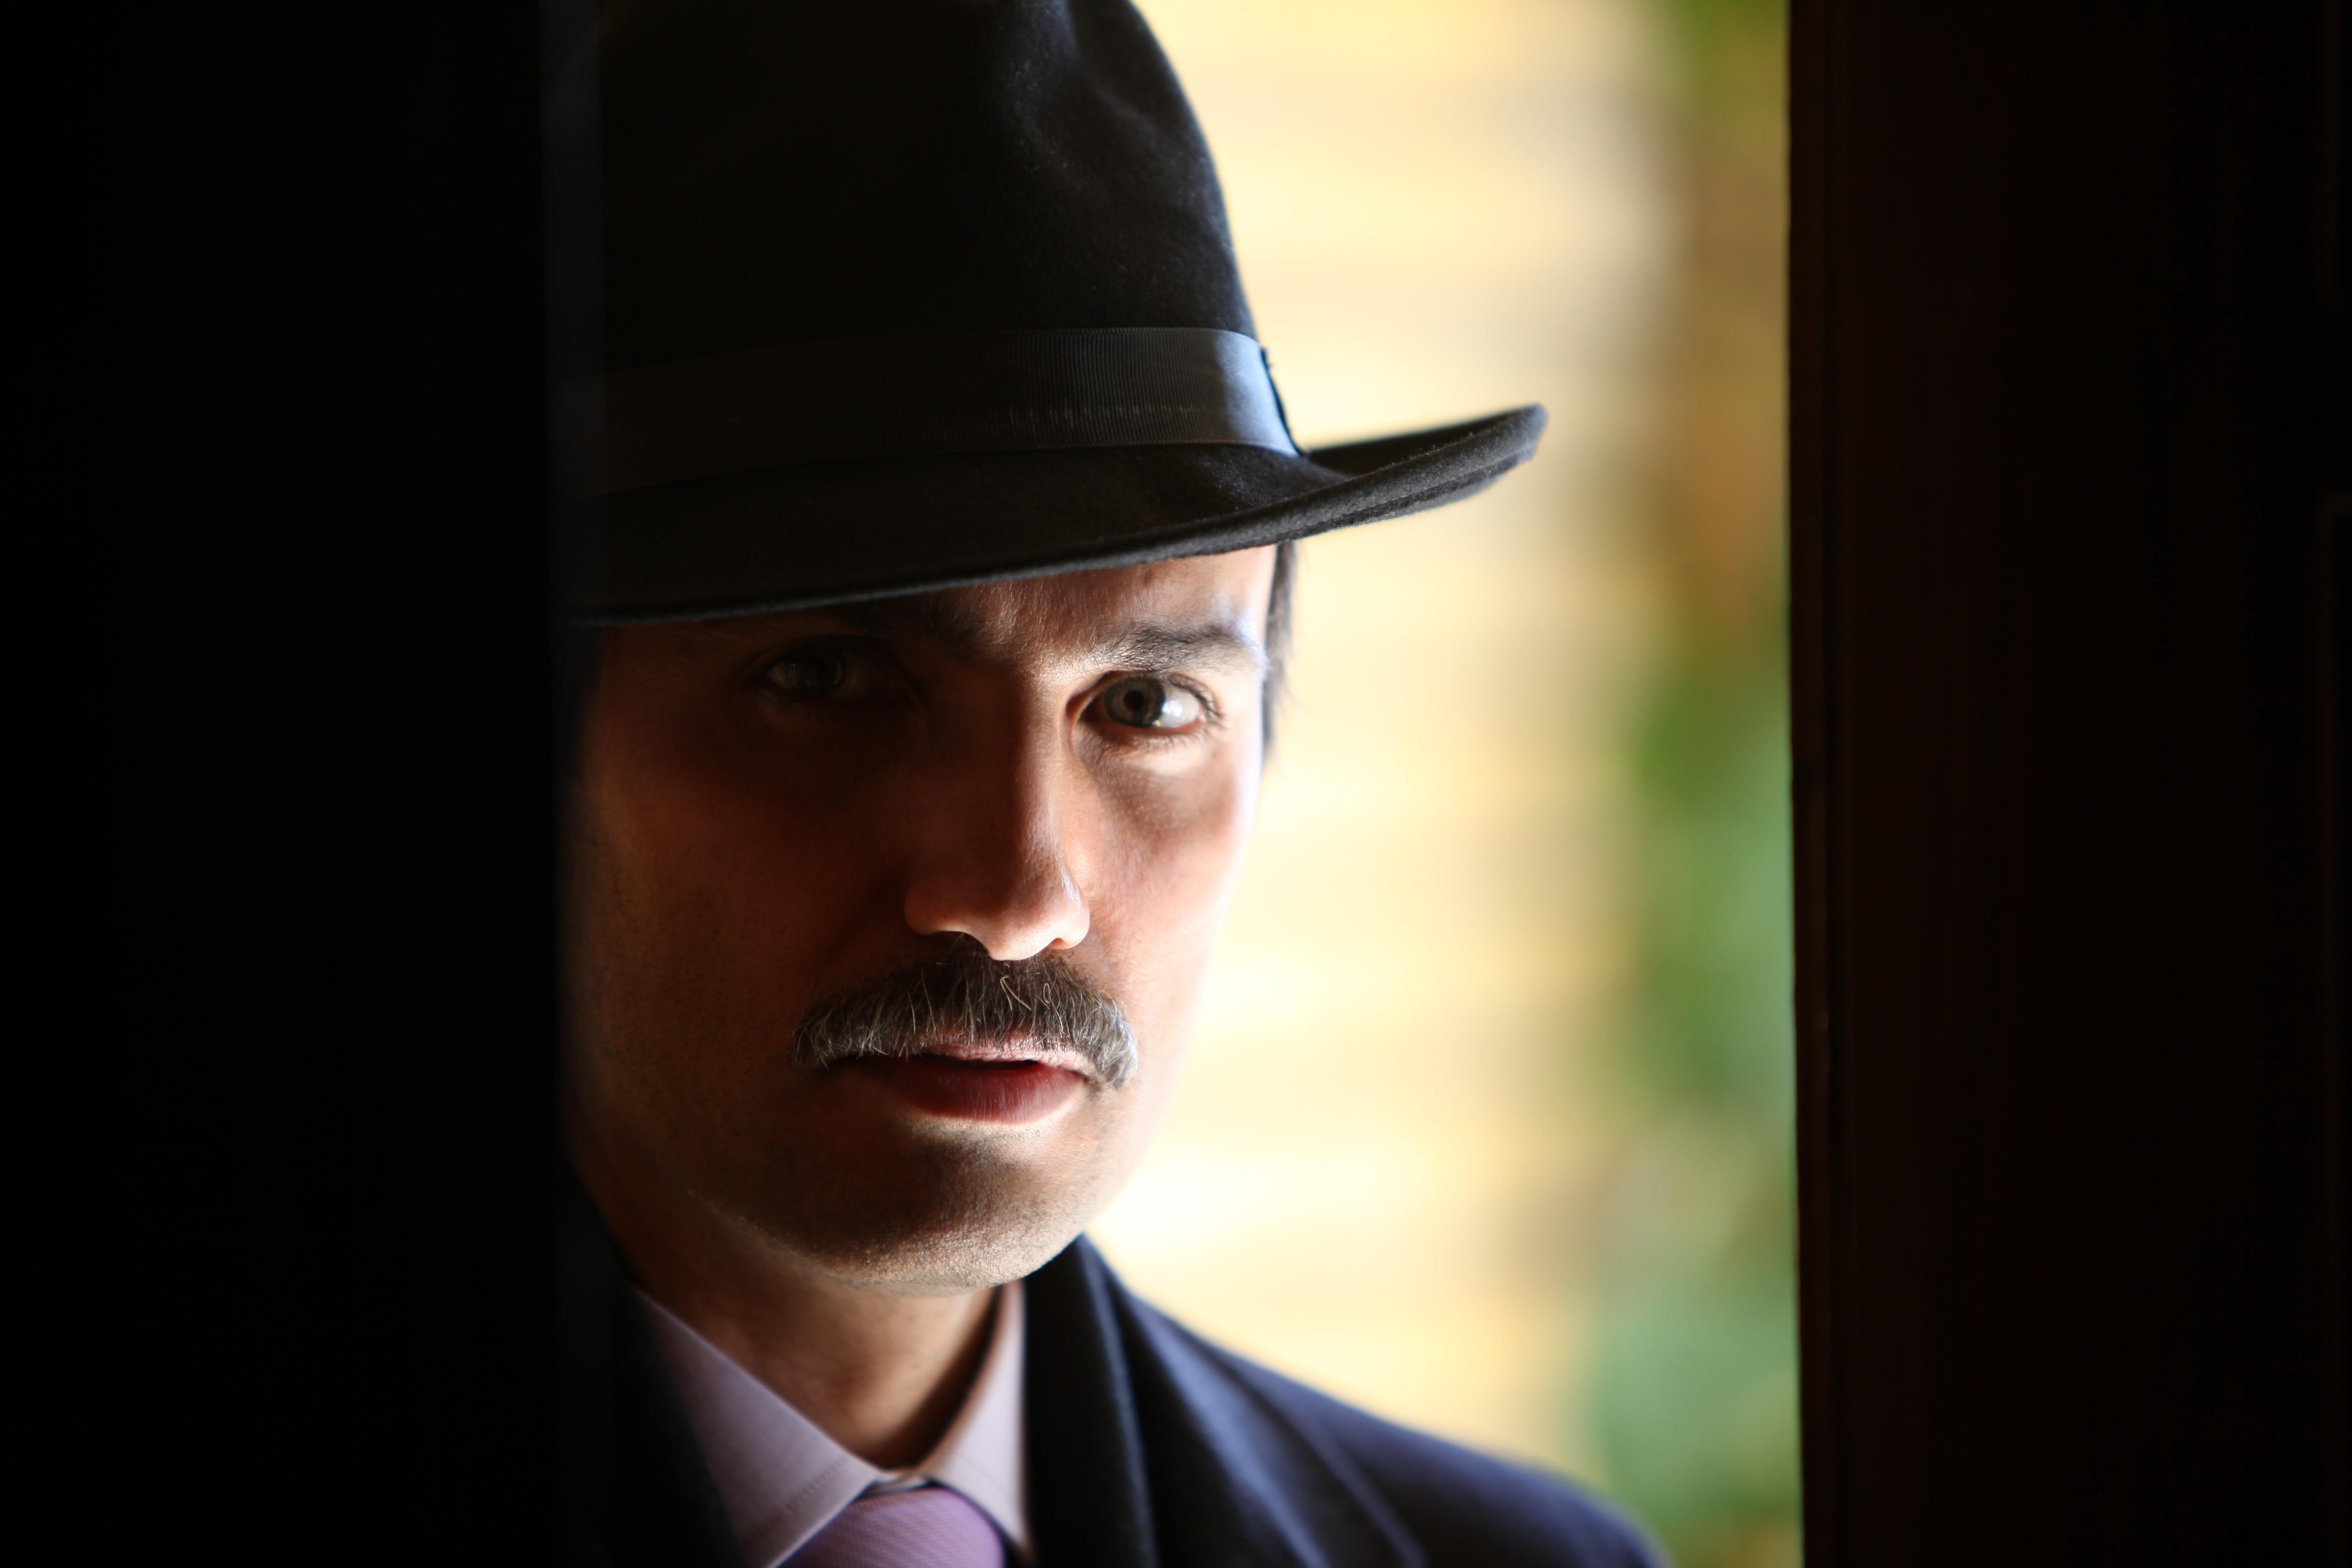 Mohammad Reza Forutan in Mohakeme dar khiaban (2009)